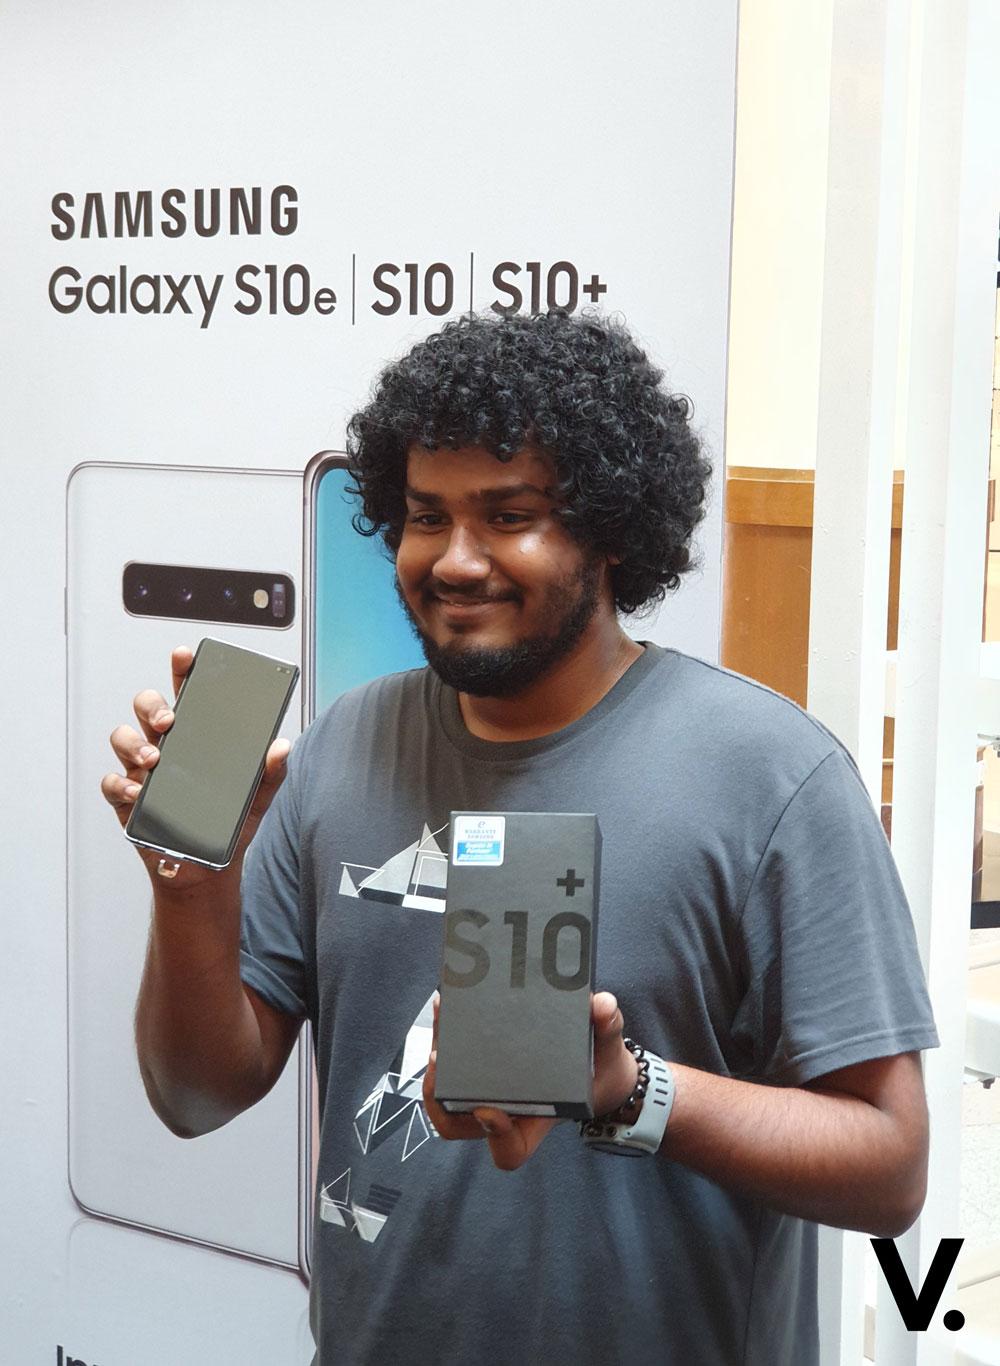 Samsung Galaxy S10 road show